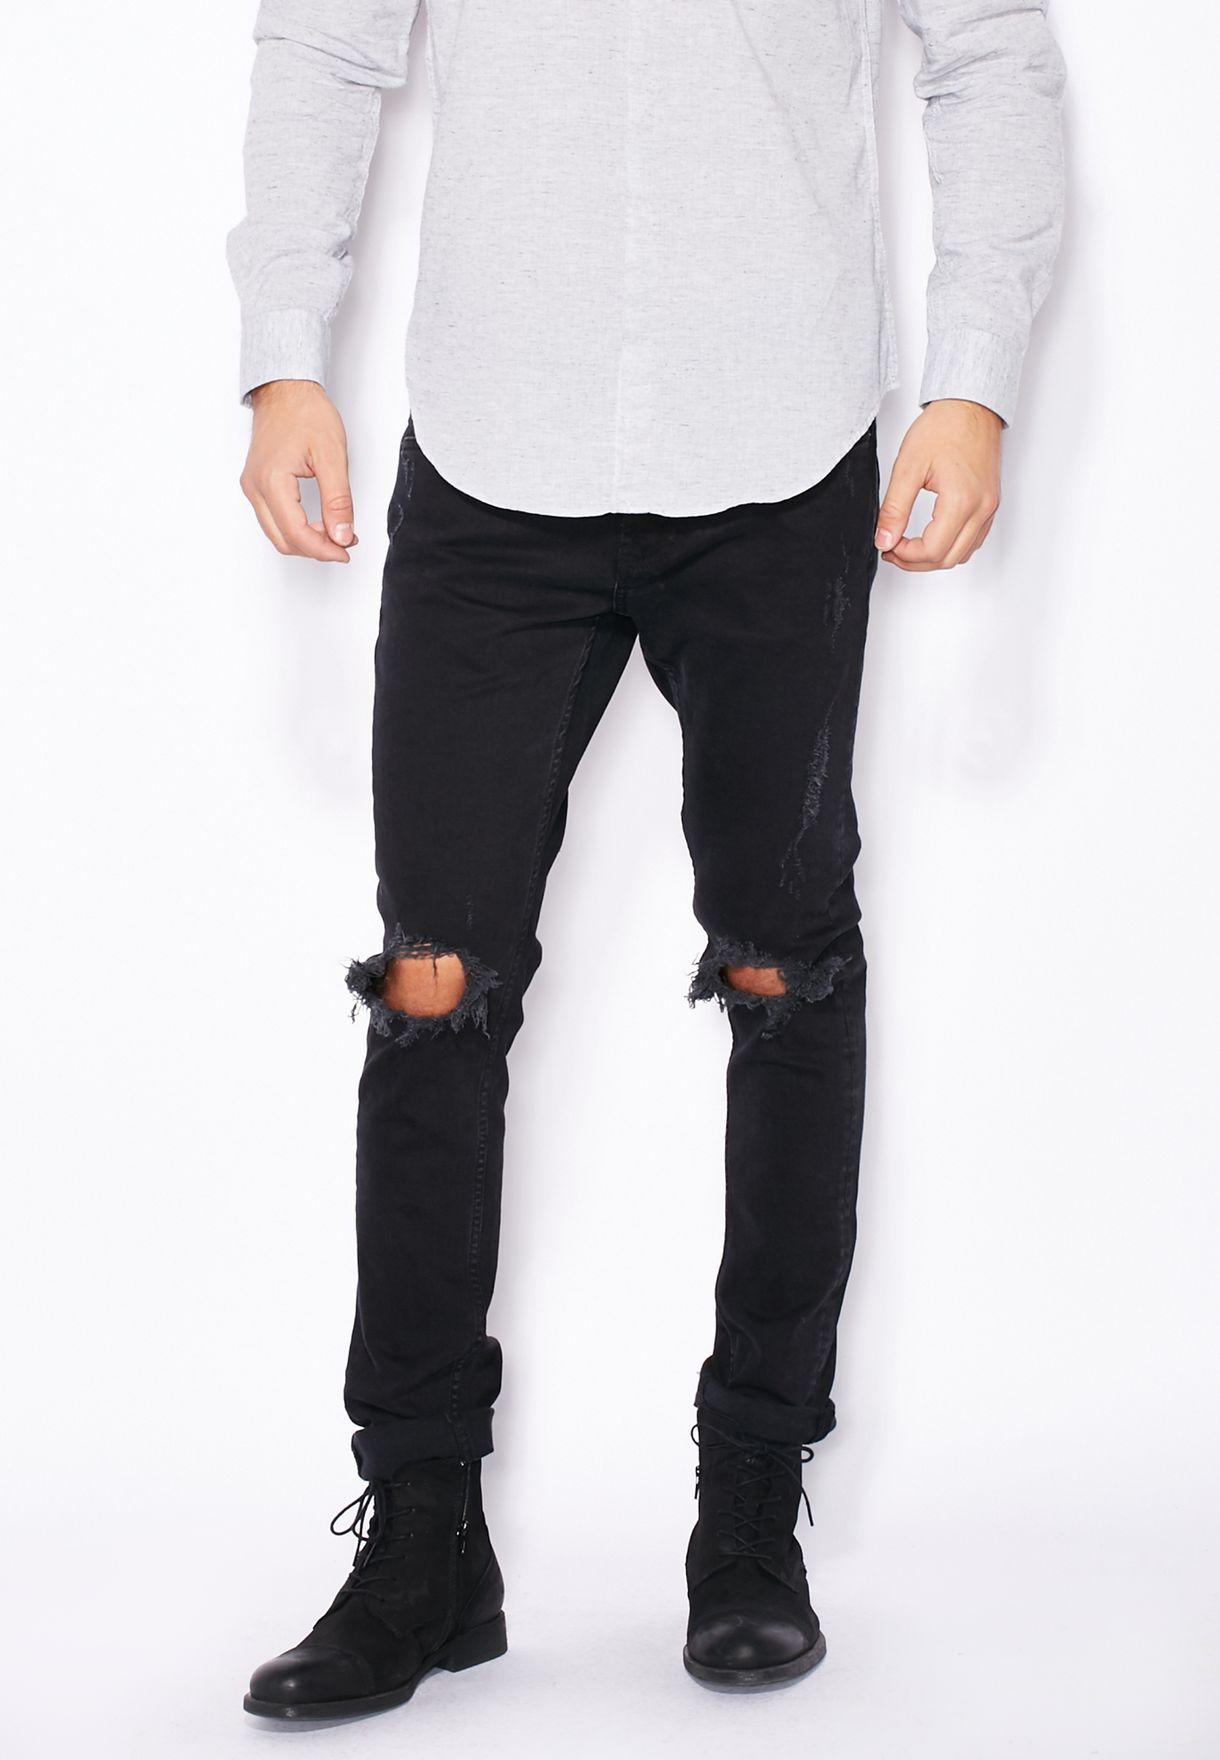 ebbd2c9ca0 Shop Only sons black Warp Slim Fit Dark Wash Ripped Jeans for Men in ...